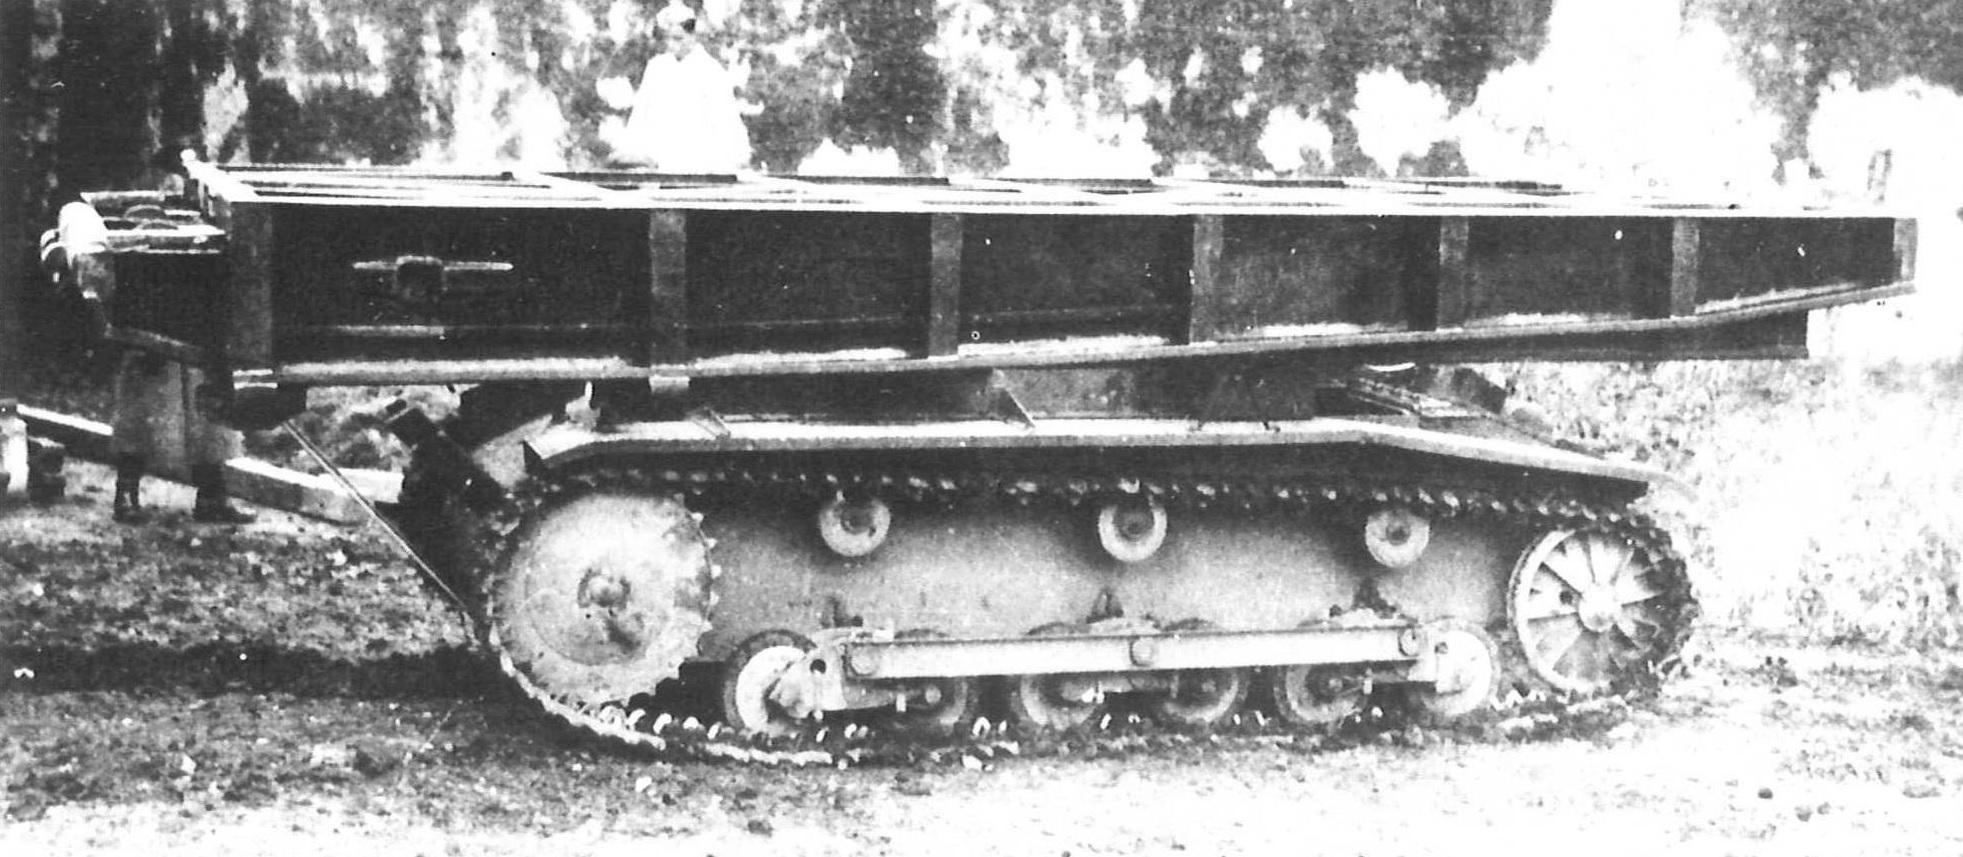 Brückenleger auf Panzerkampfwagen II Ausf. B